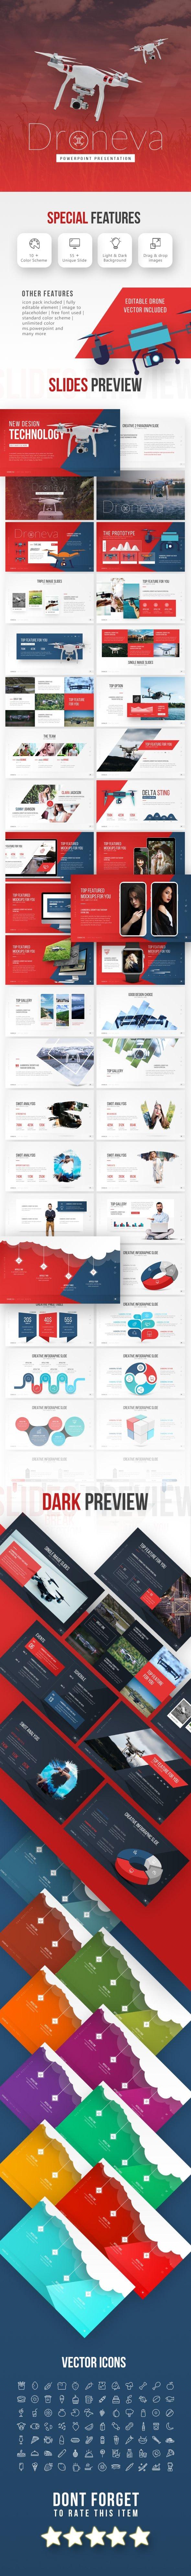 Droneva - Technology PowerPoint Template - PowerPoint Templates Presentation Templates